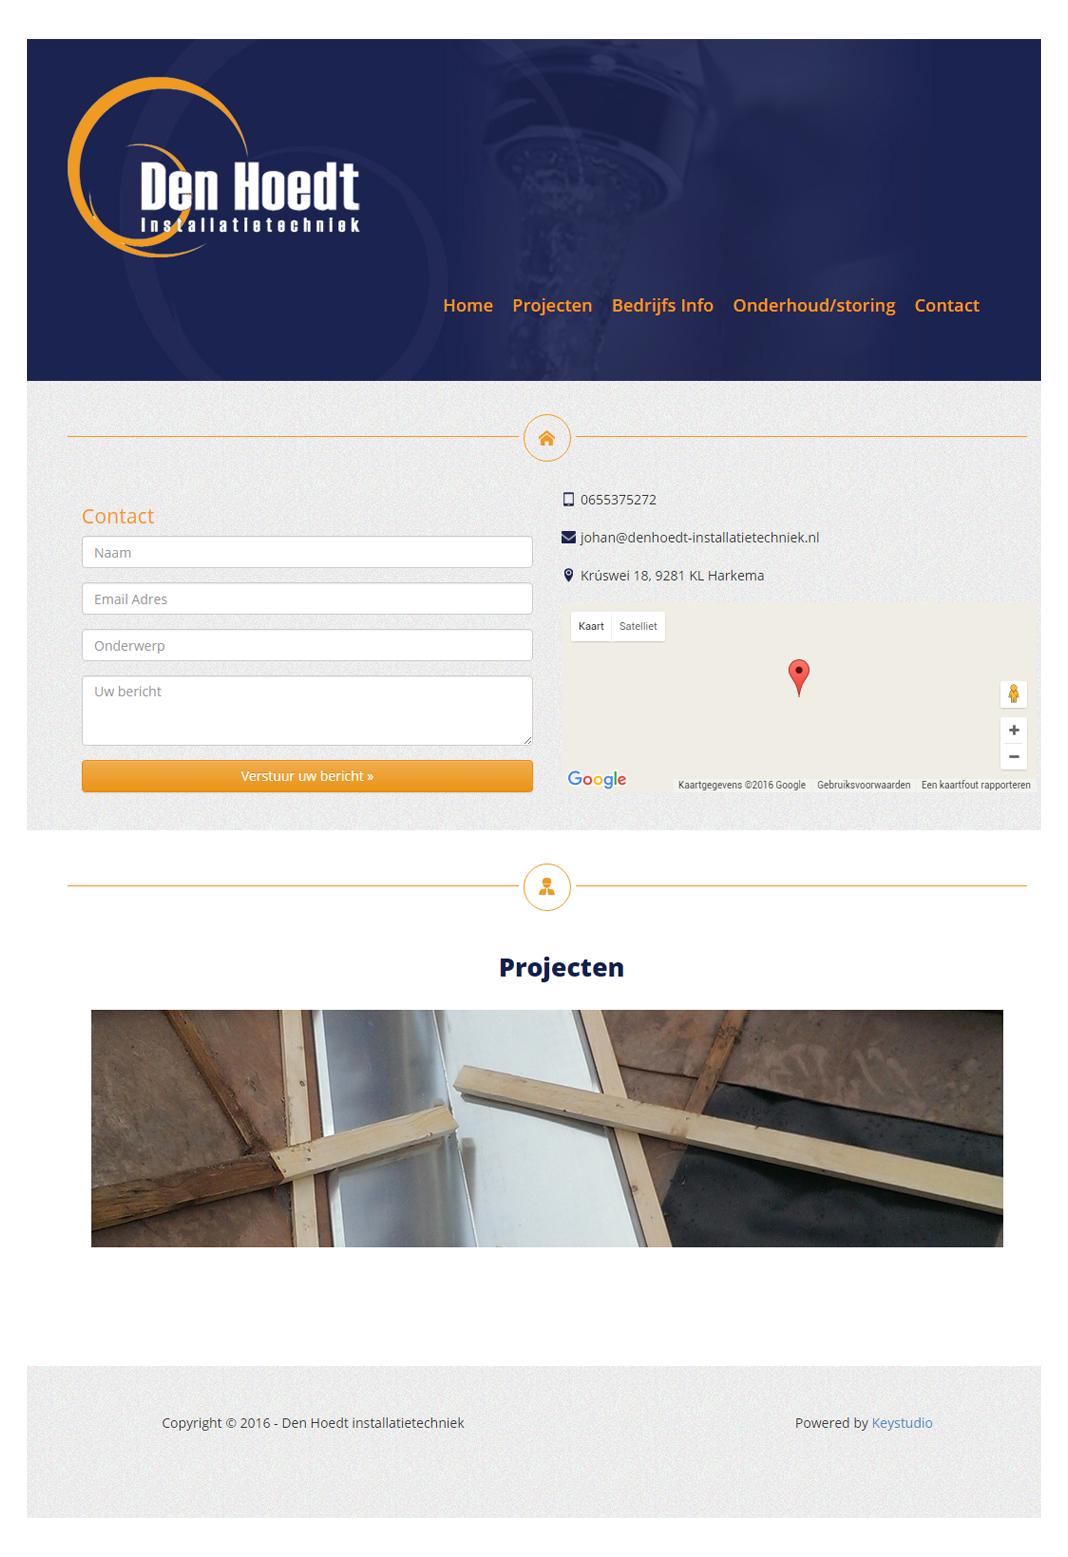 single project Info